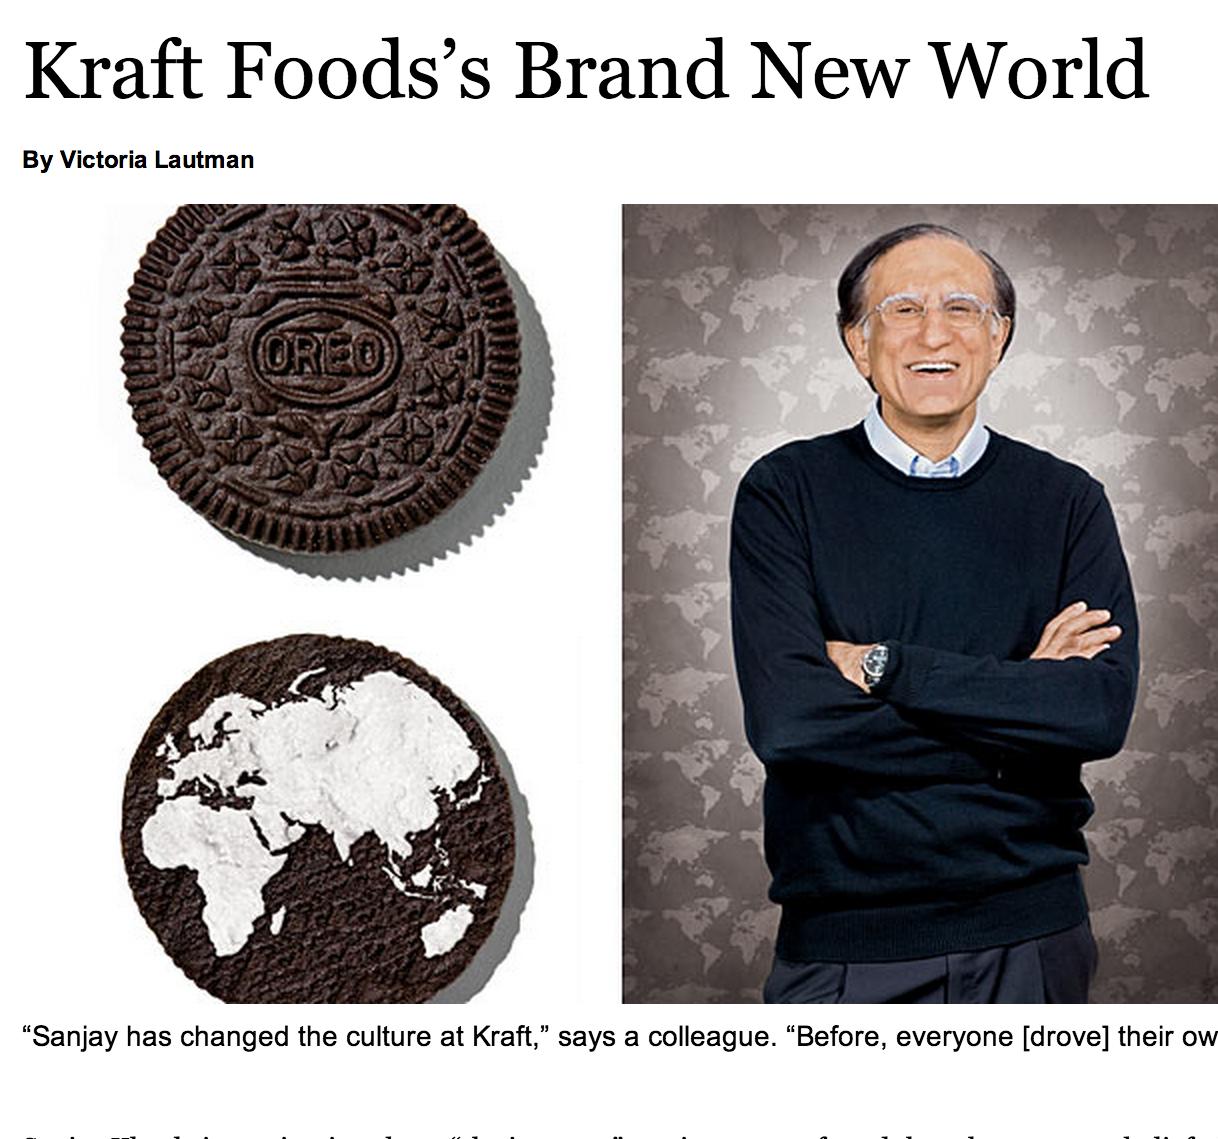 Kraft Foods's Brand New World